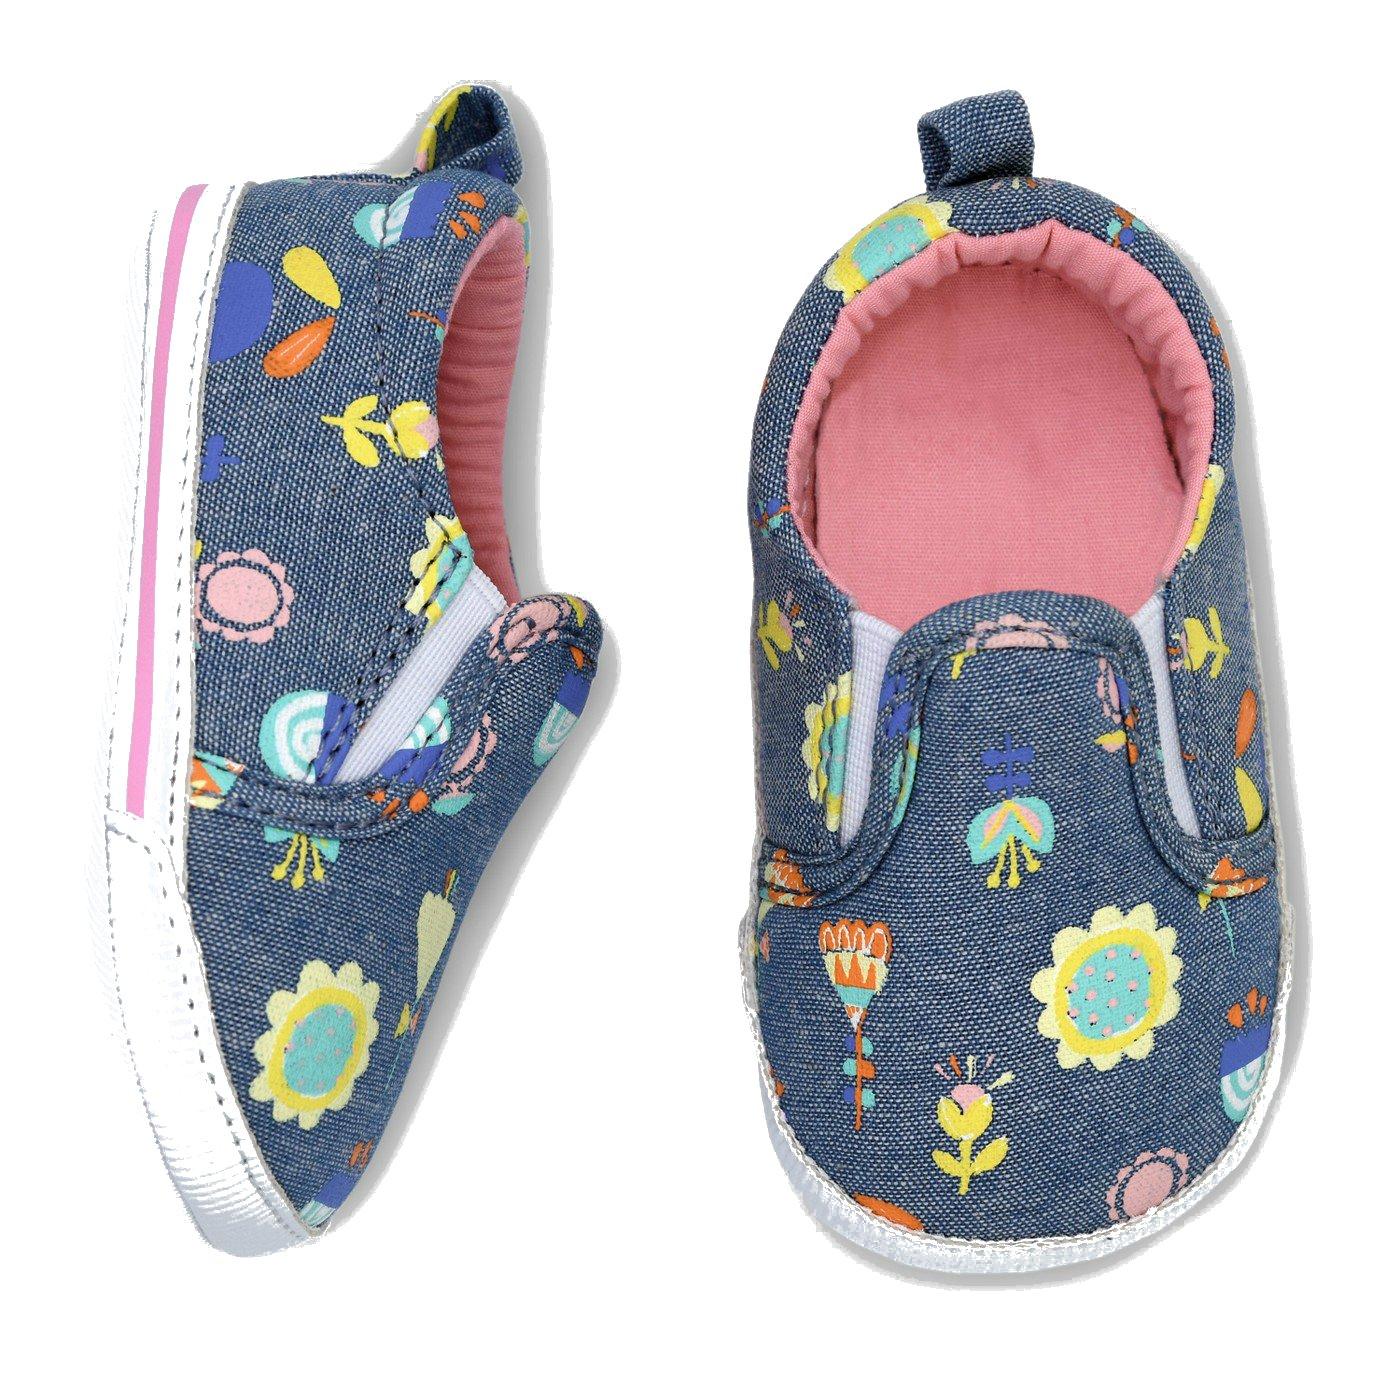 0-3 Months Baby Girls Slip On Crib Shoes Elastic Navy//Floral Denim Pink Inside